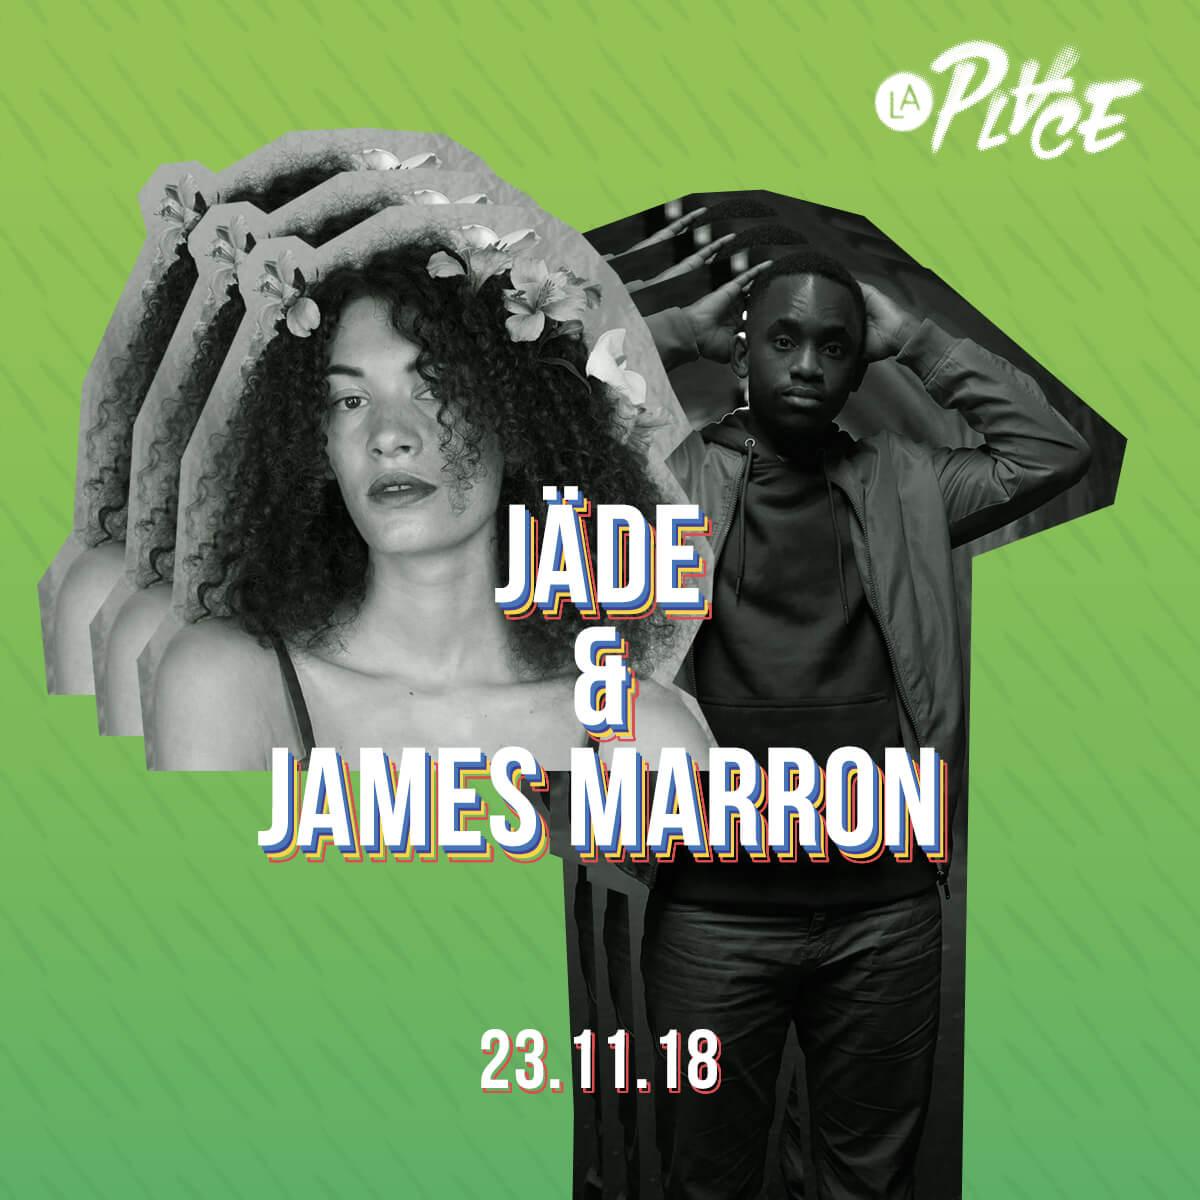 jade-james-artistes-instagram-3 (1)